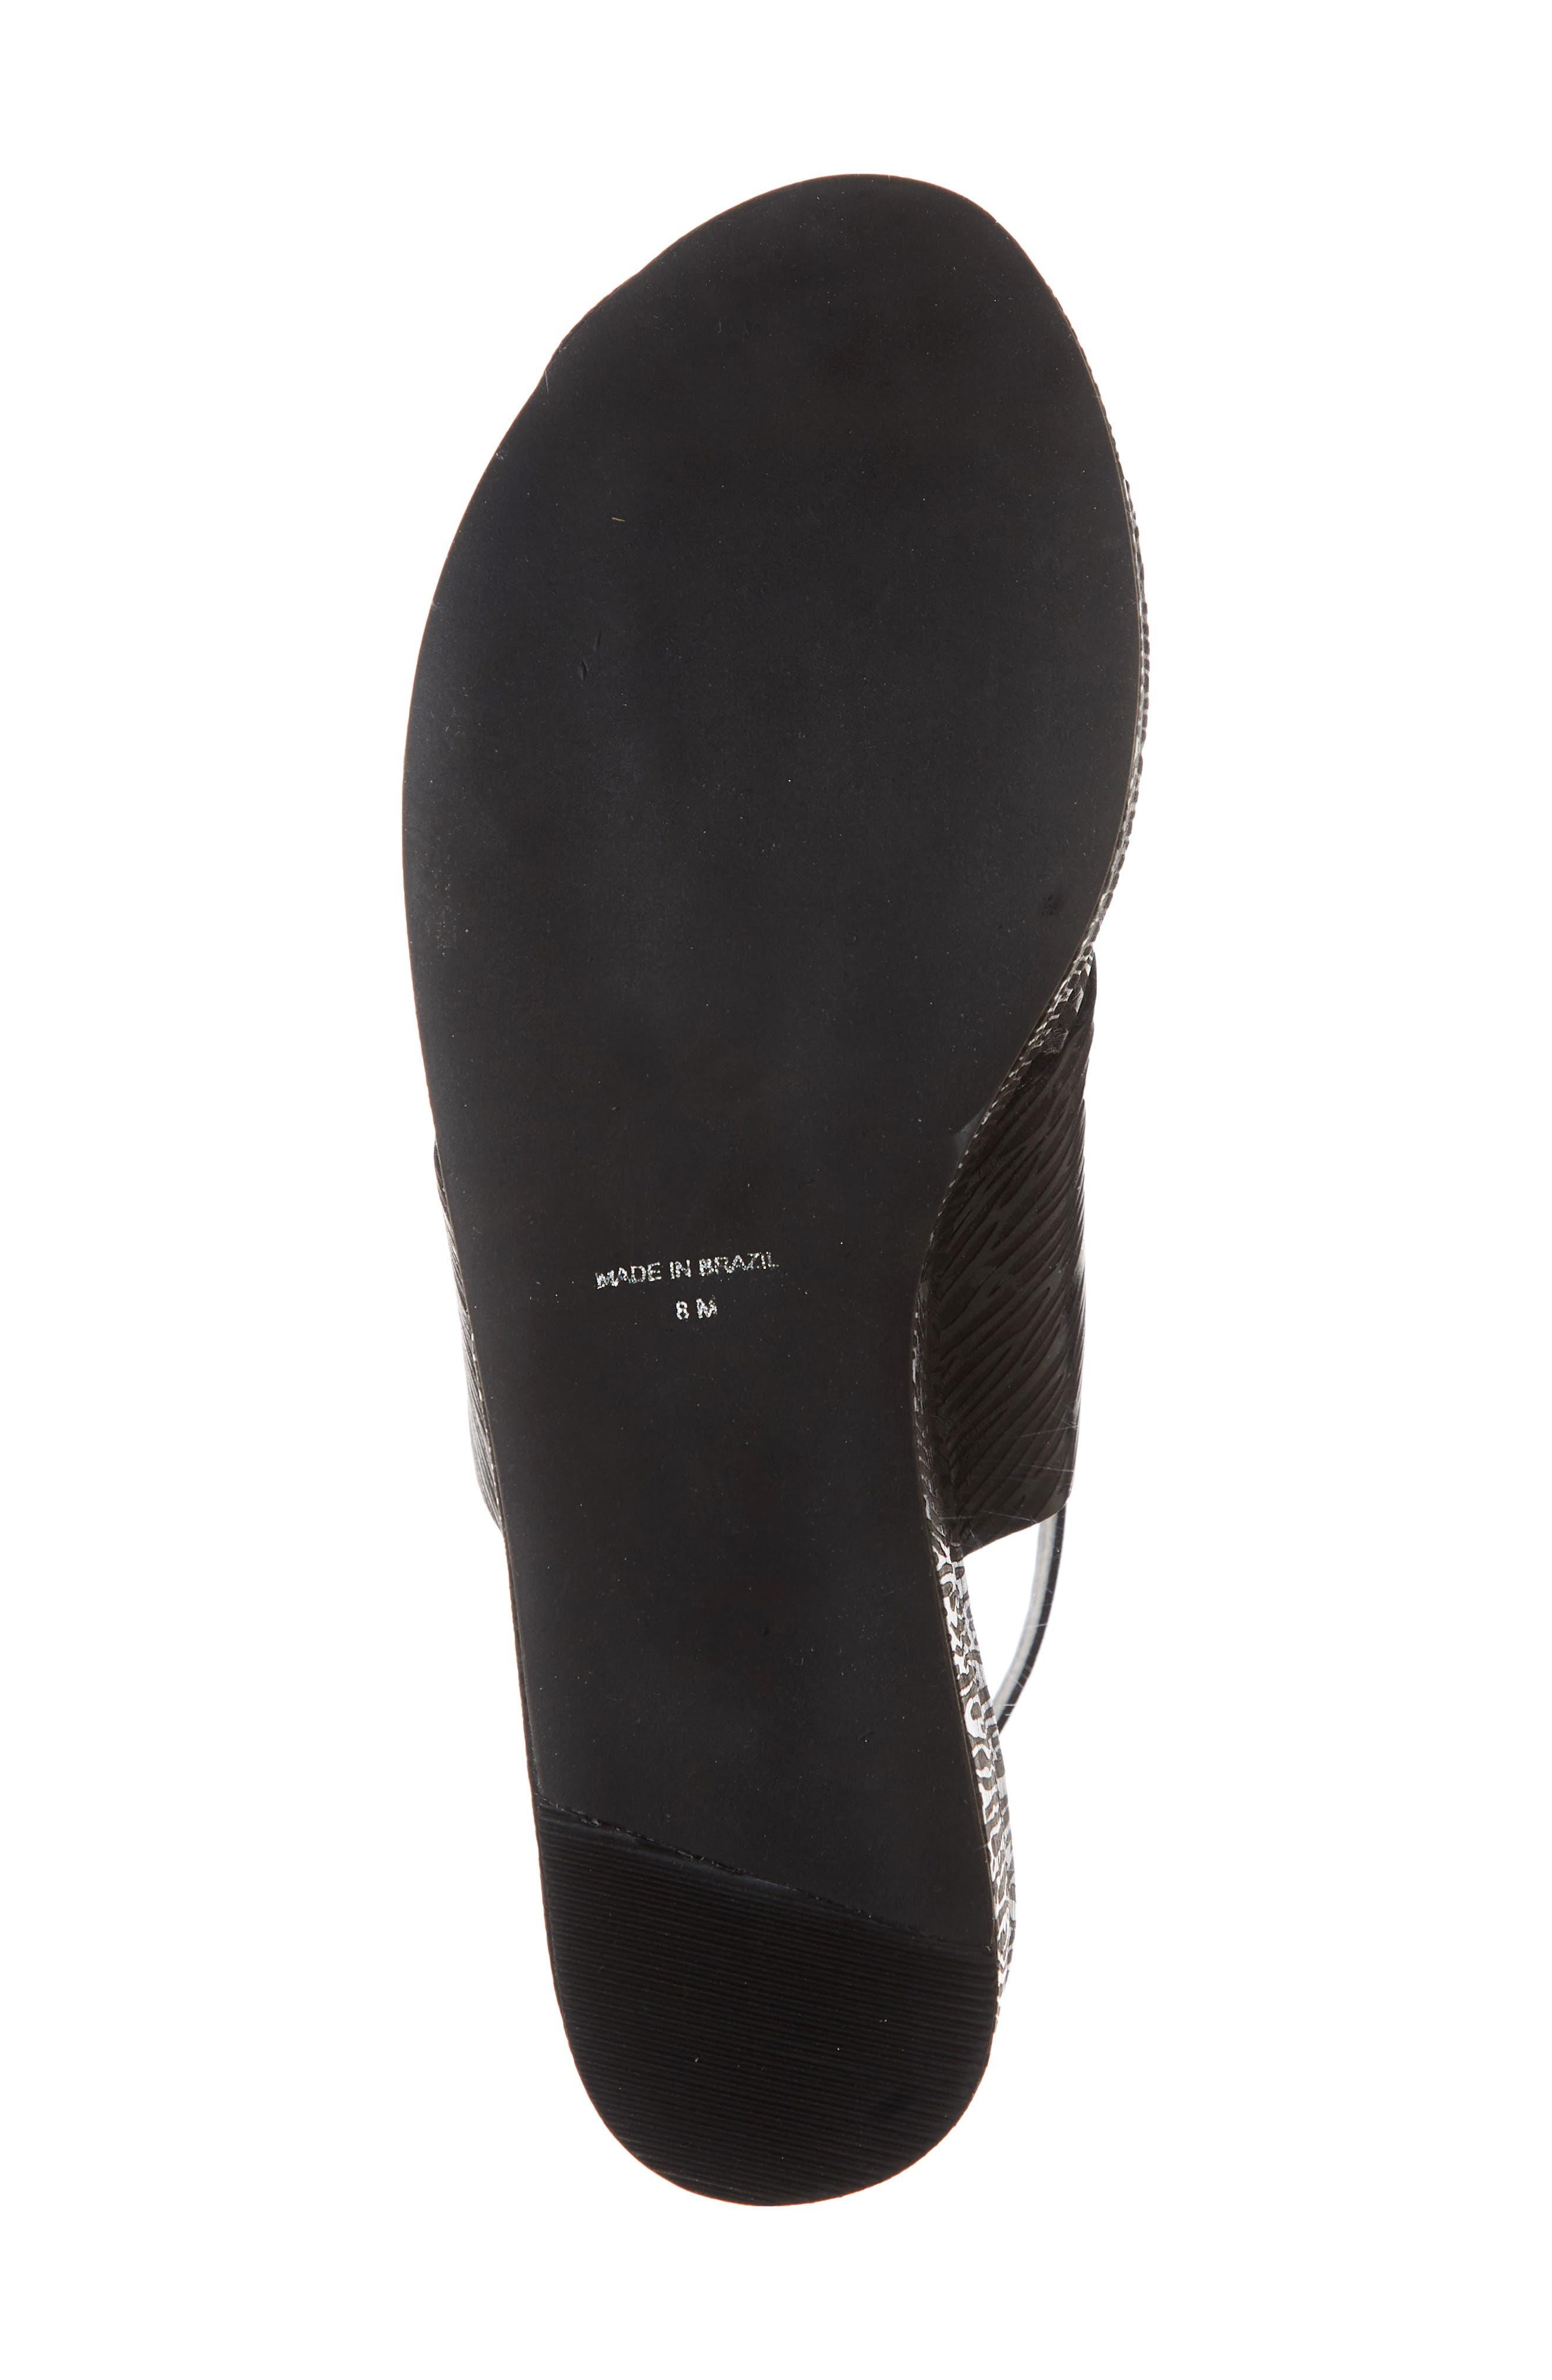 Runway Wedge Sandal,                             Alternate thumbnail 6, color,                             Black Lizard Print Leather